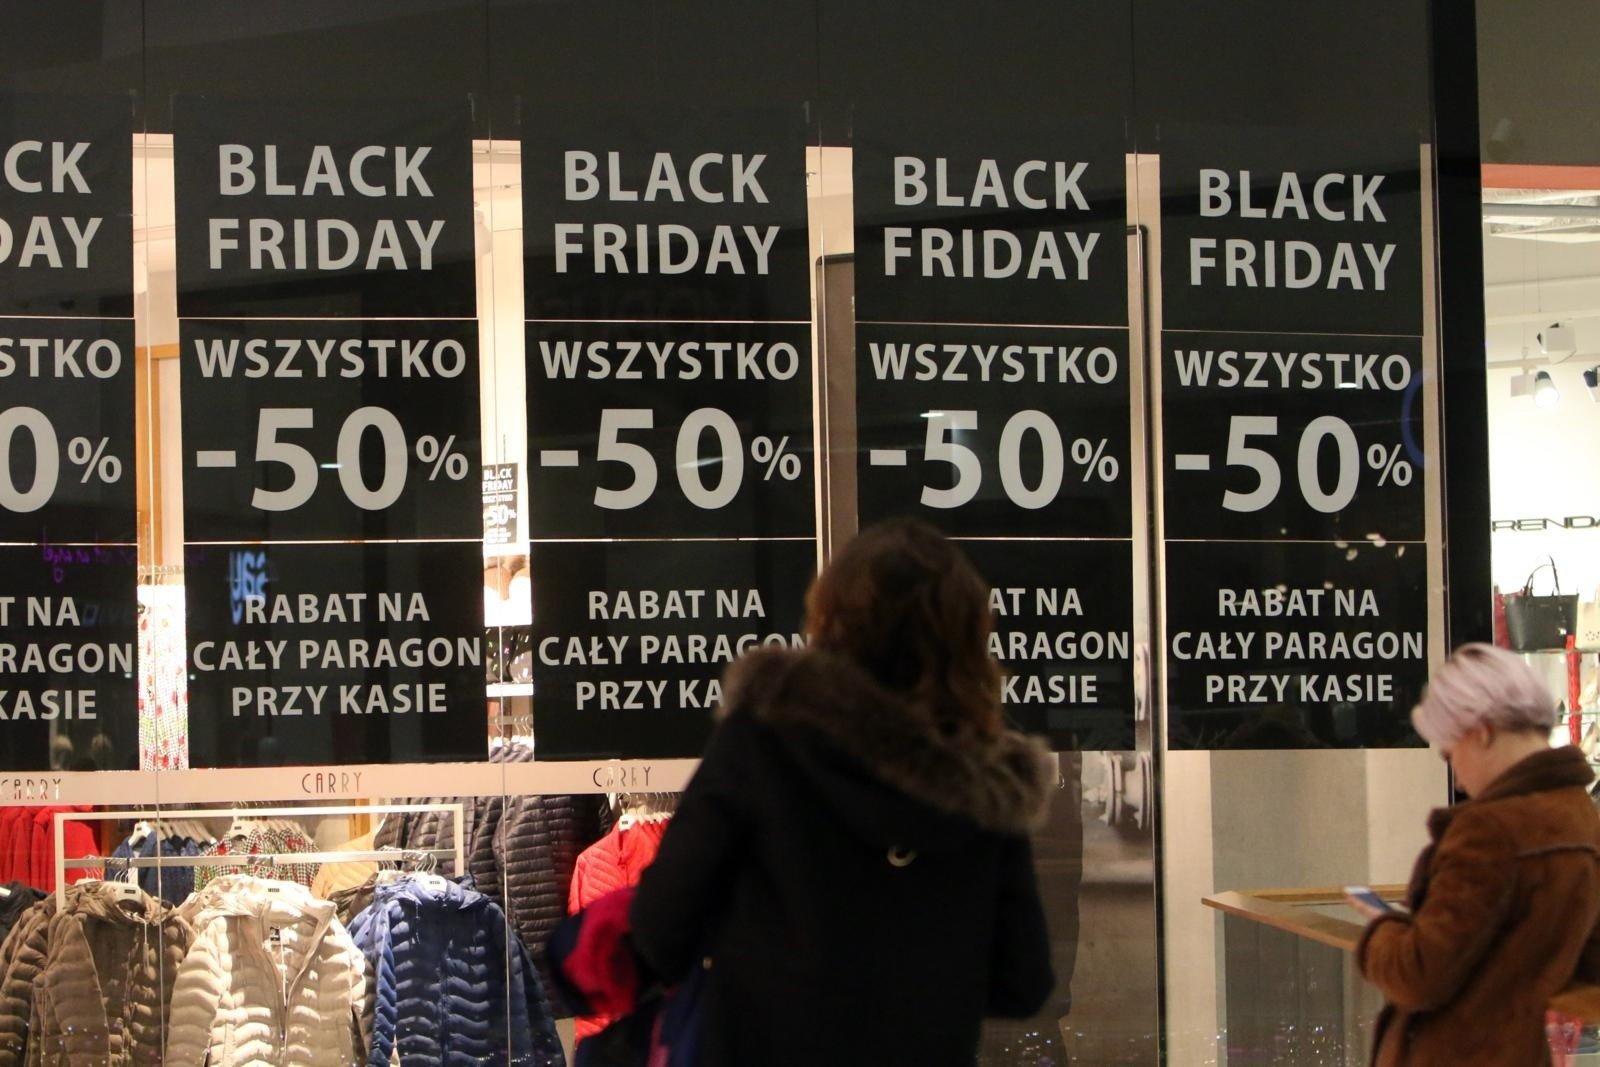 Black Friday 2019 | Modne okazje w Zalando